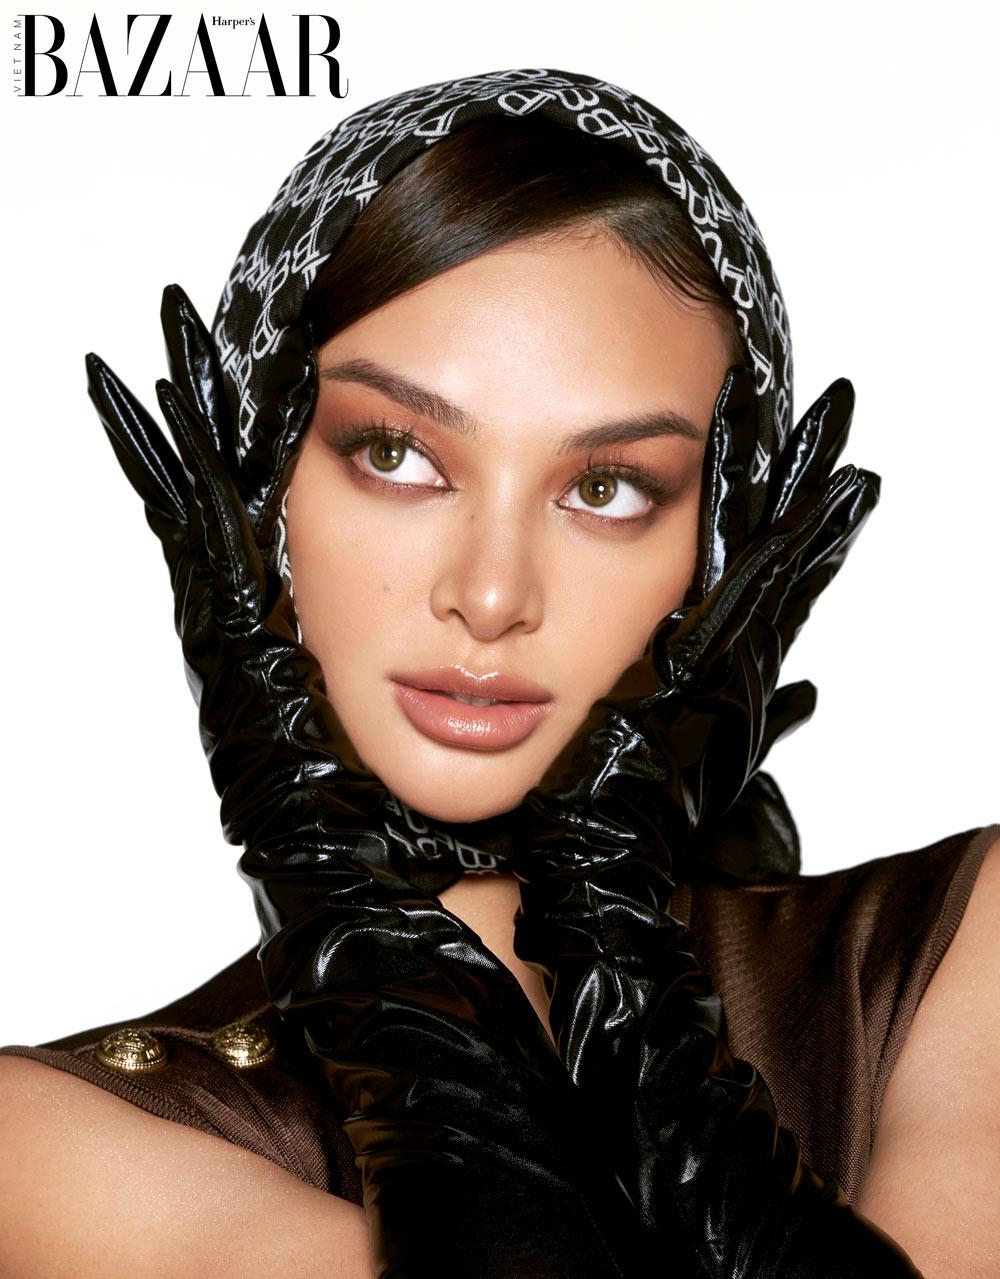 Hoa hậu Philippines Kylie Verzosa